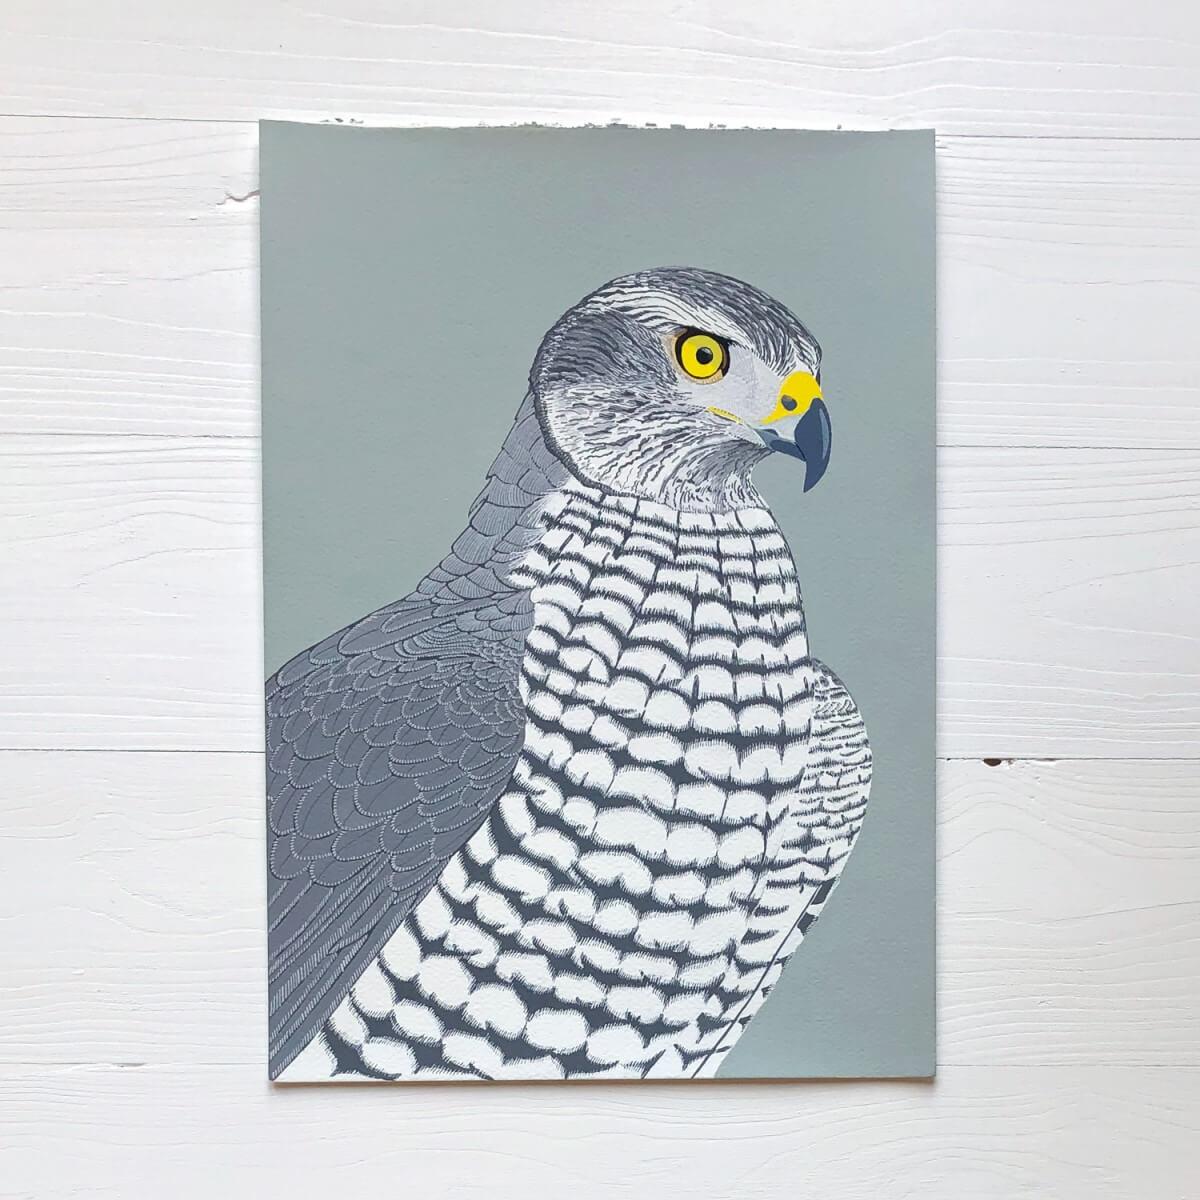 Goshawk Bird Of Prey Raptor Original Gouache Painting By Bird